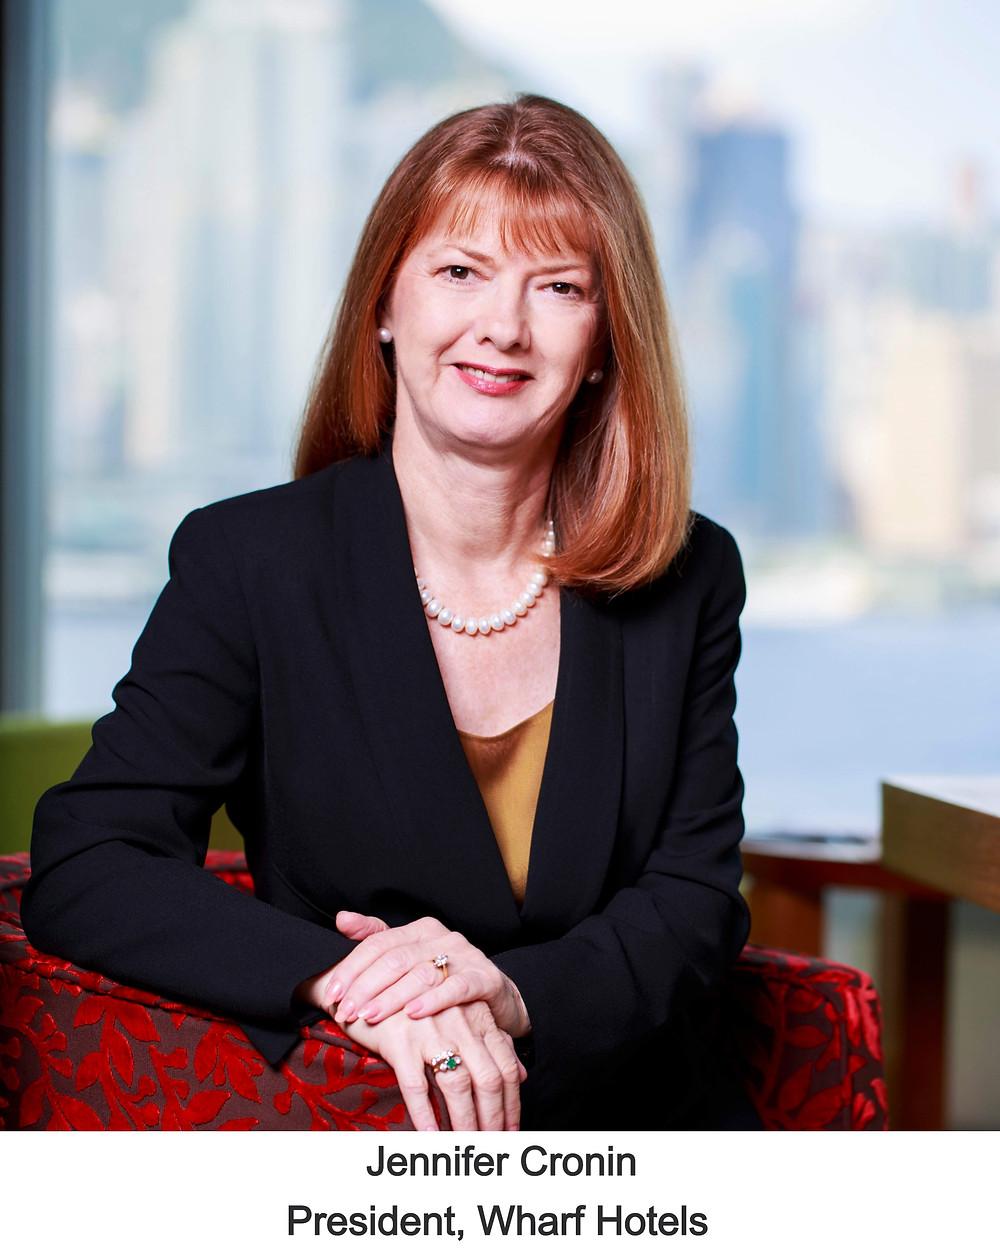 Jennifer Cronin, President Wharf Hotels